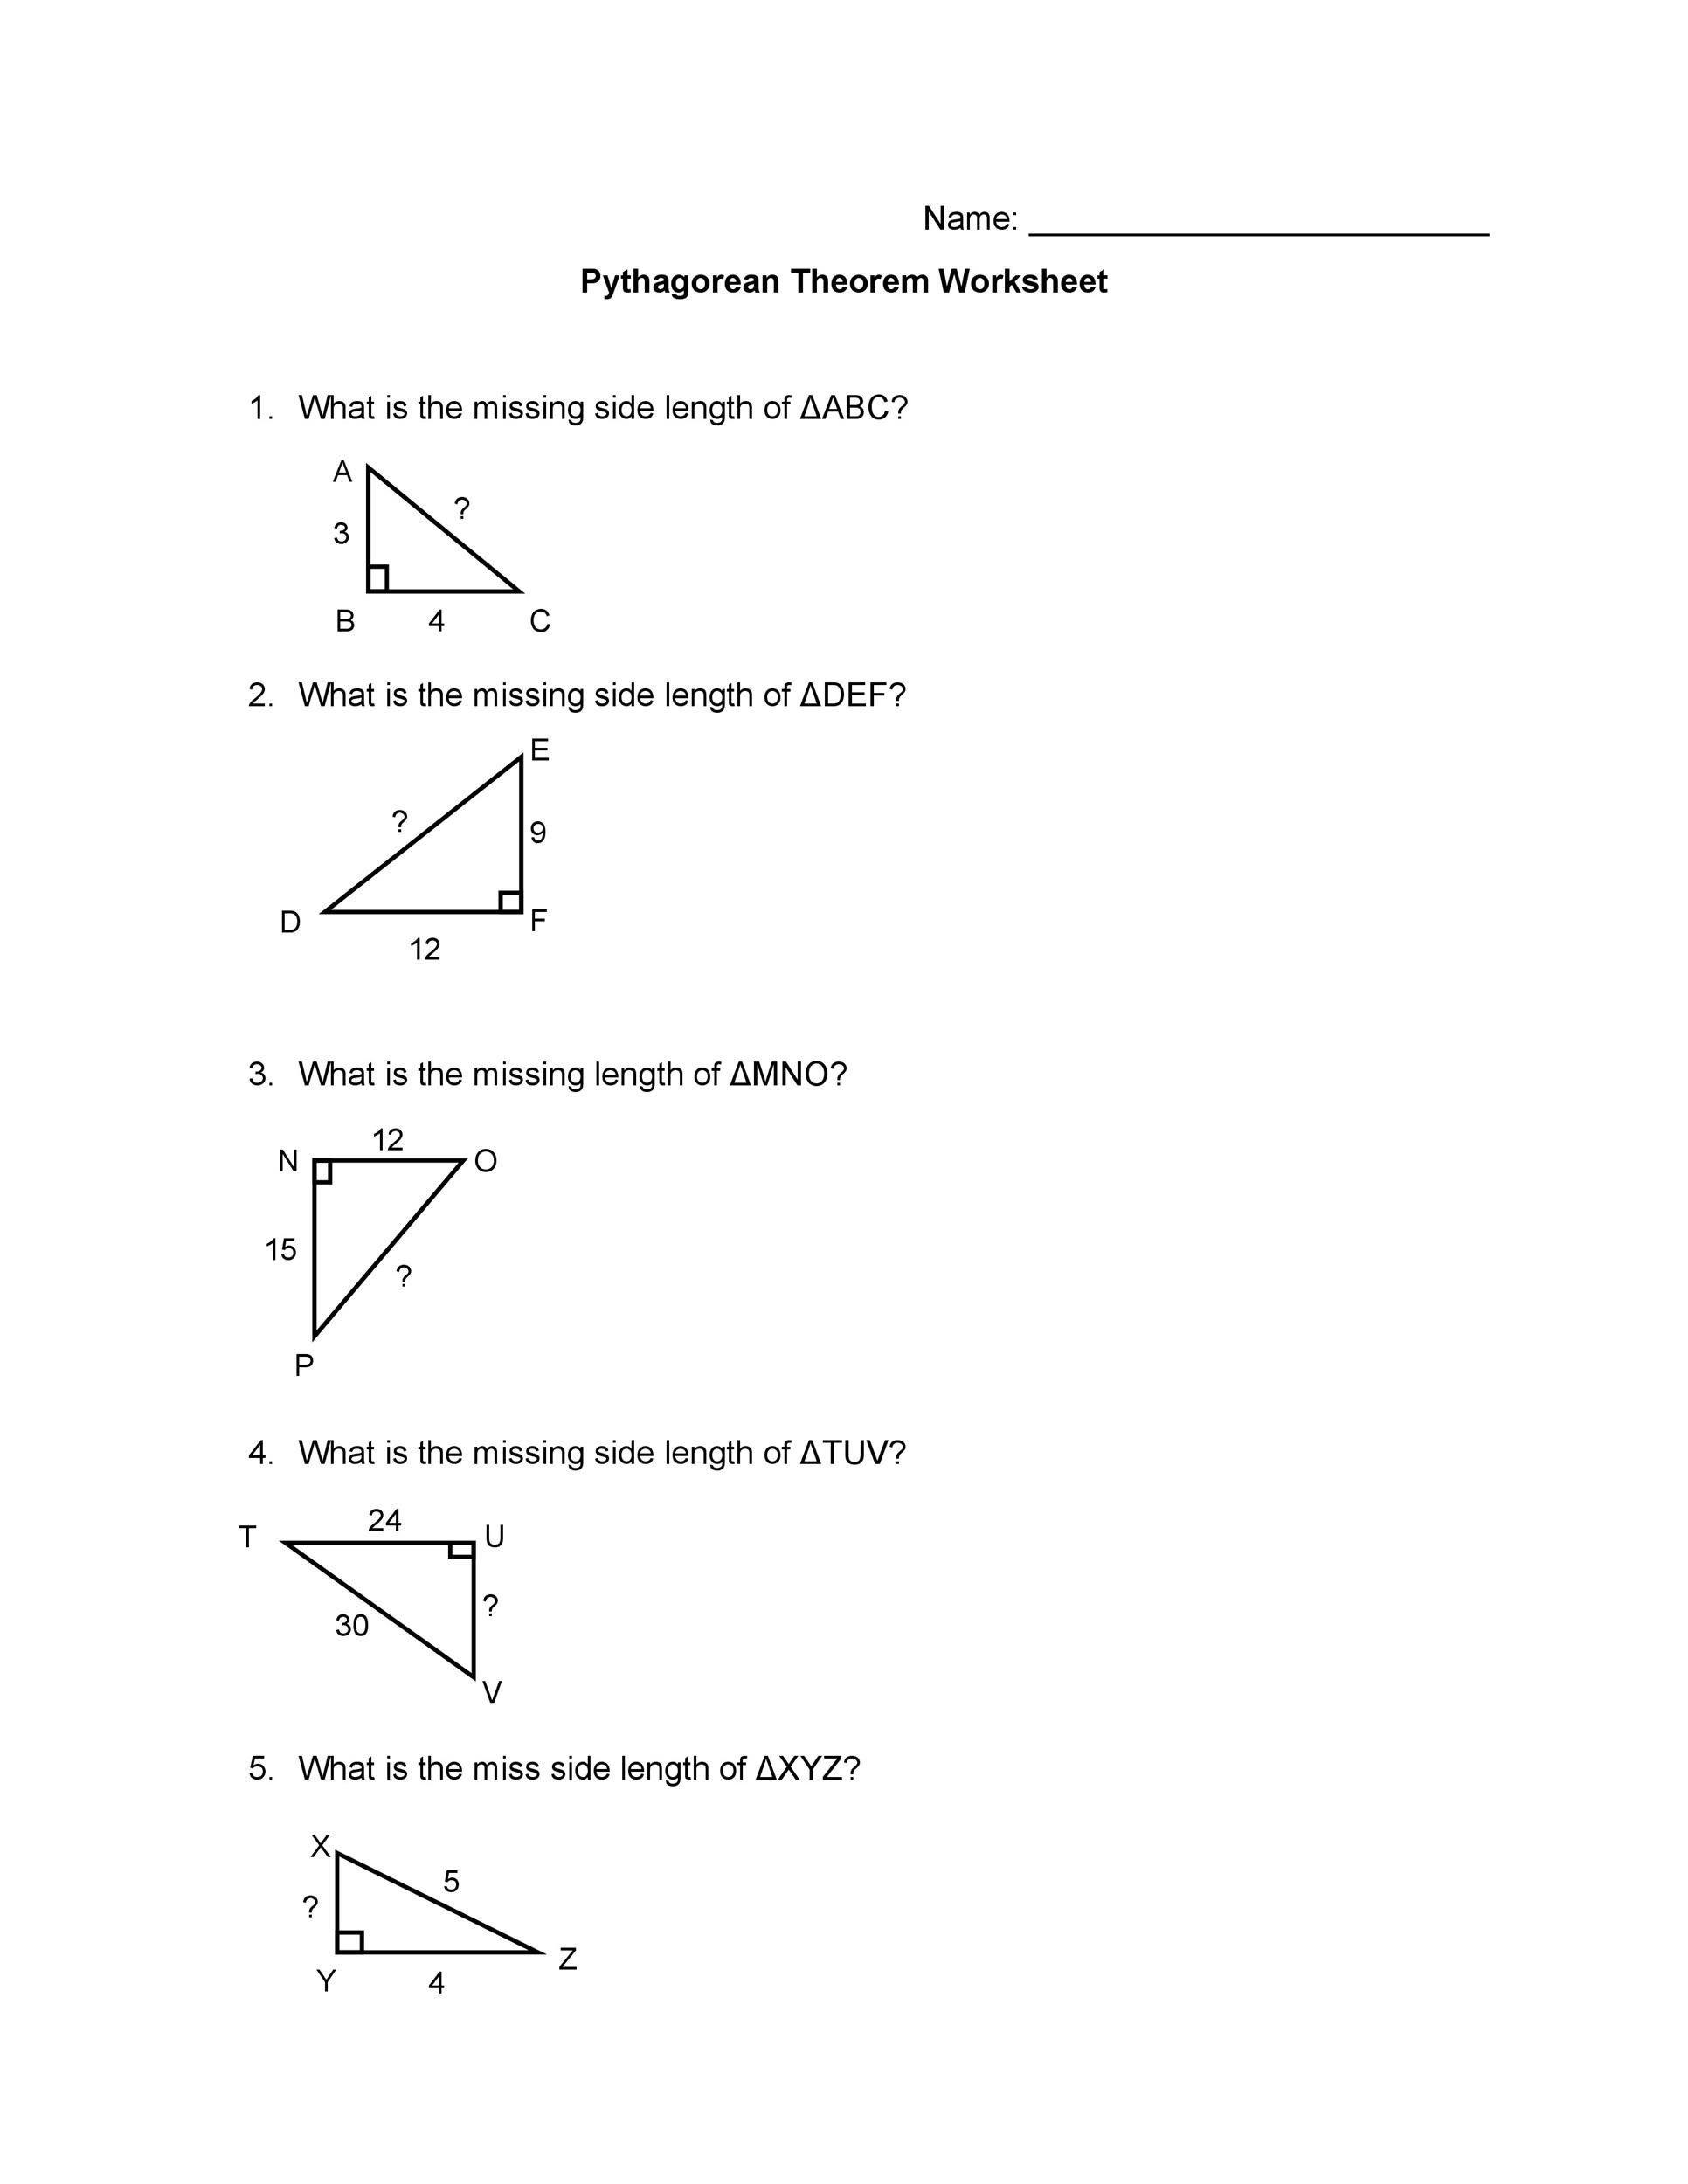 Pythagorean Theorem Word Problems Worksheet Math Pythagorean Theorem Word Problems Worksheets Theor In 2020 Word Problem Worksheets Word Problems Pythagorean Theorem